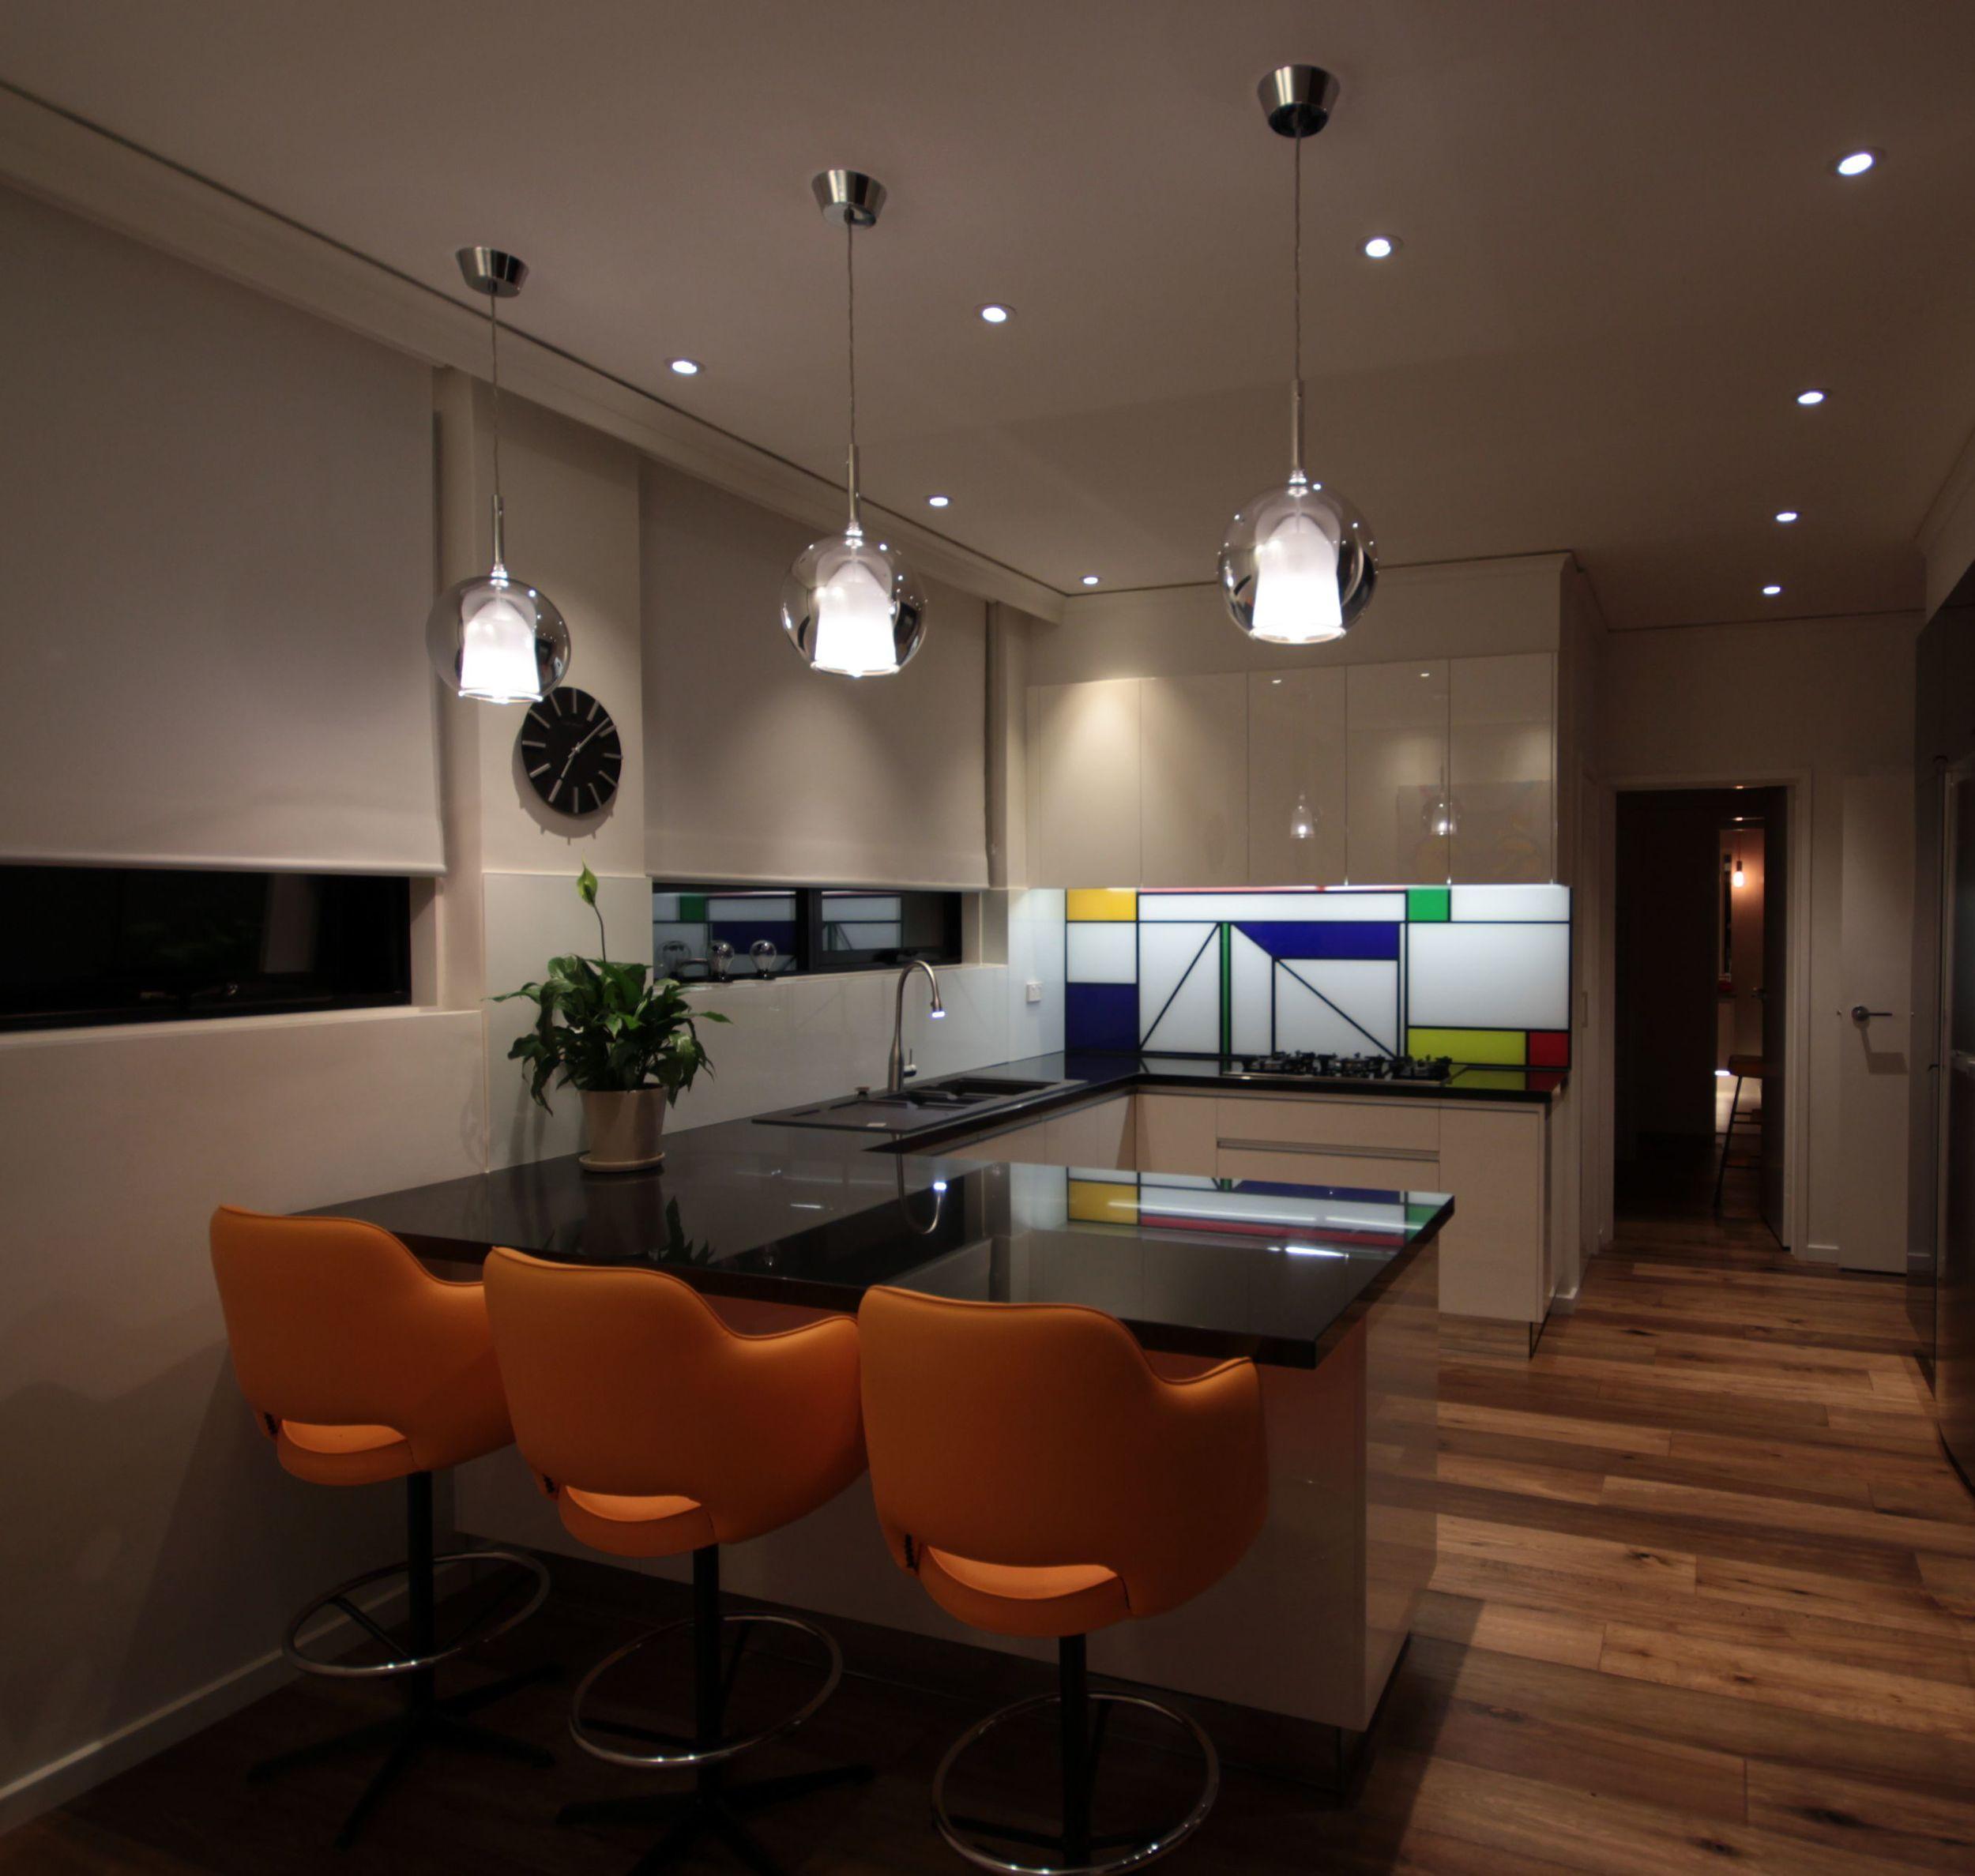 Kitchen2LightingDesign.jpg